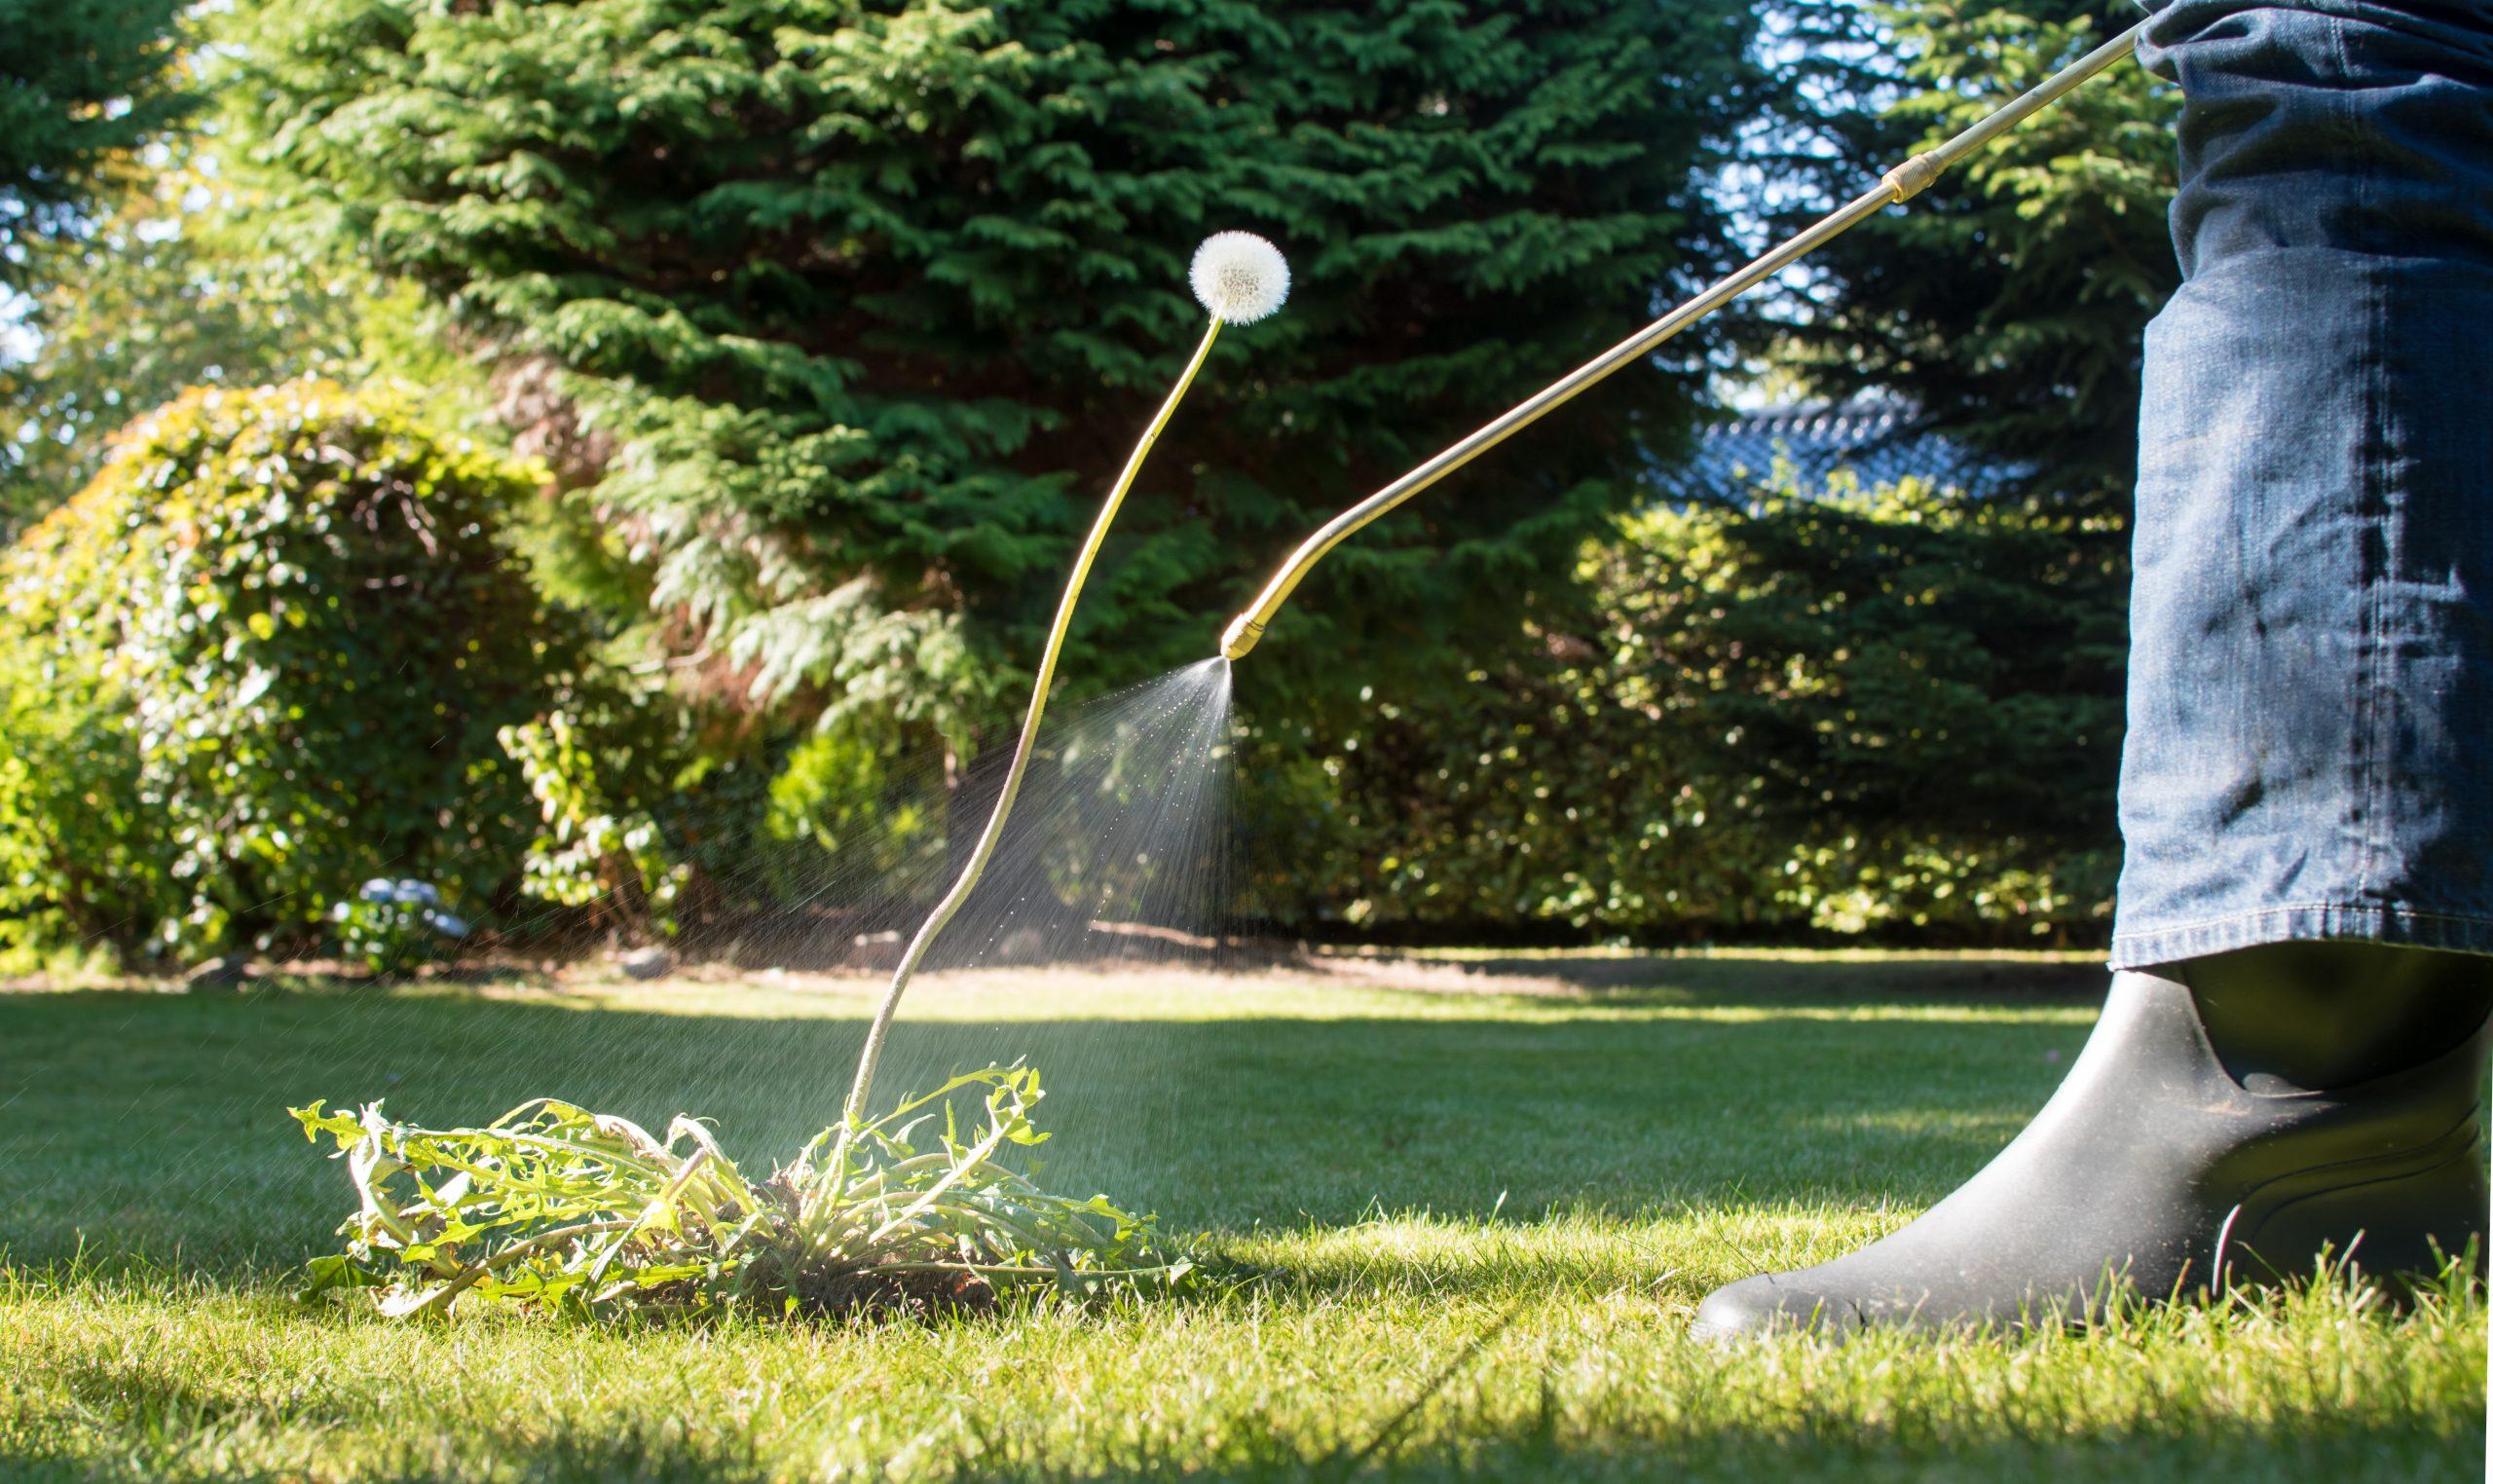 spraying weeds on lawn